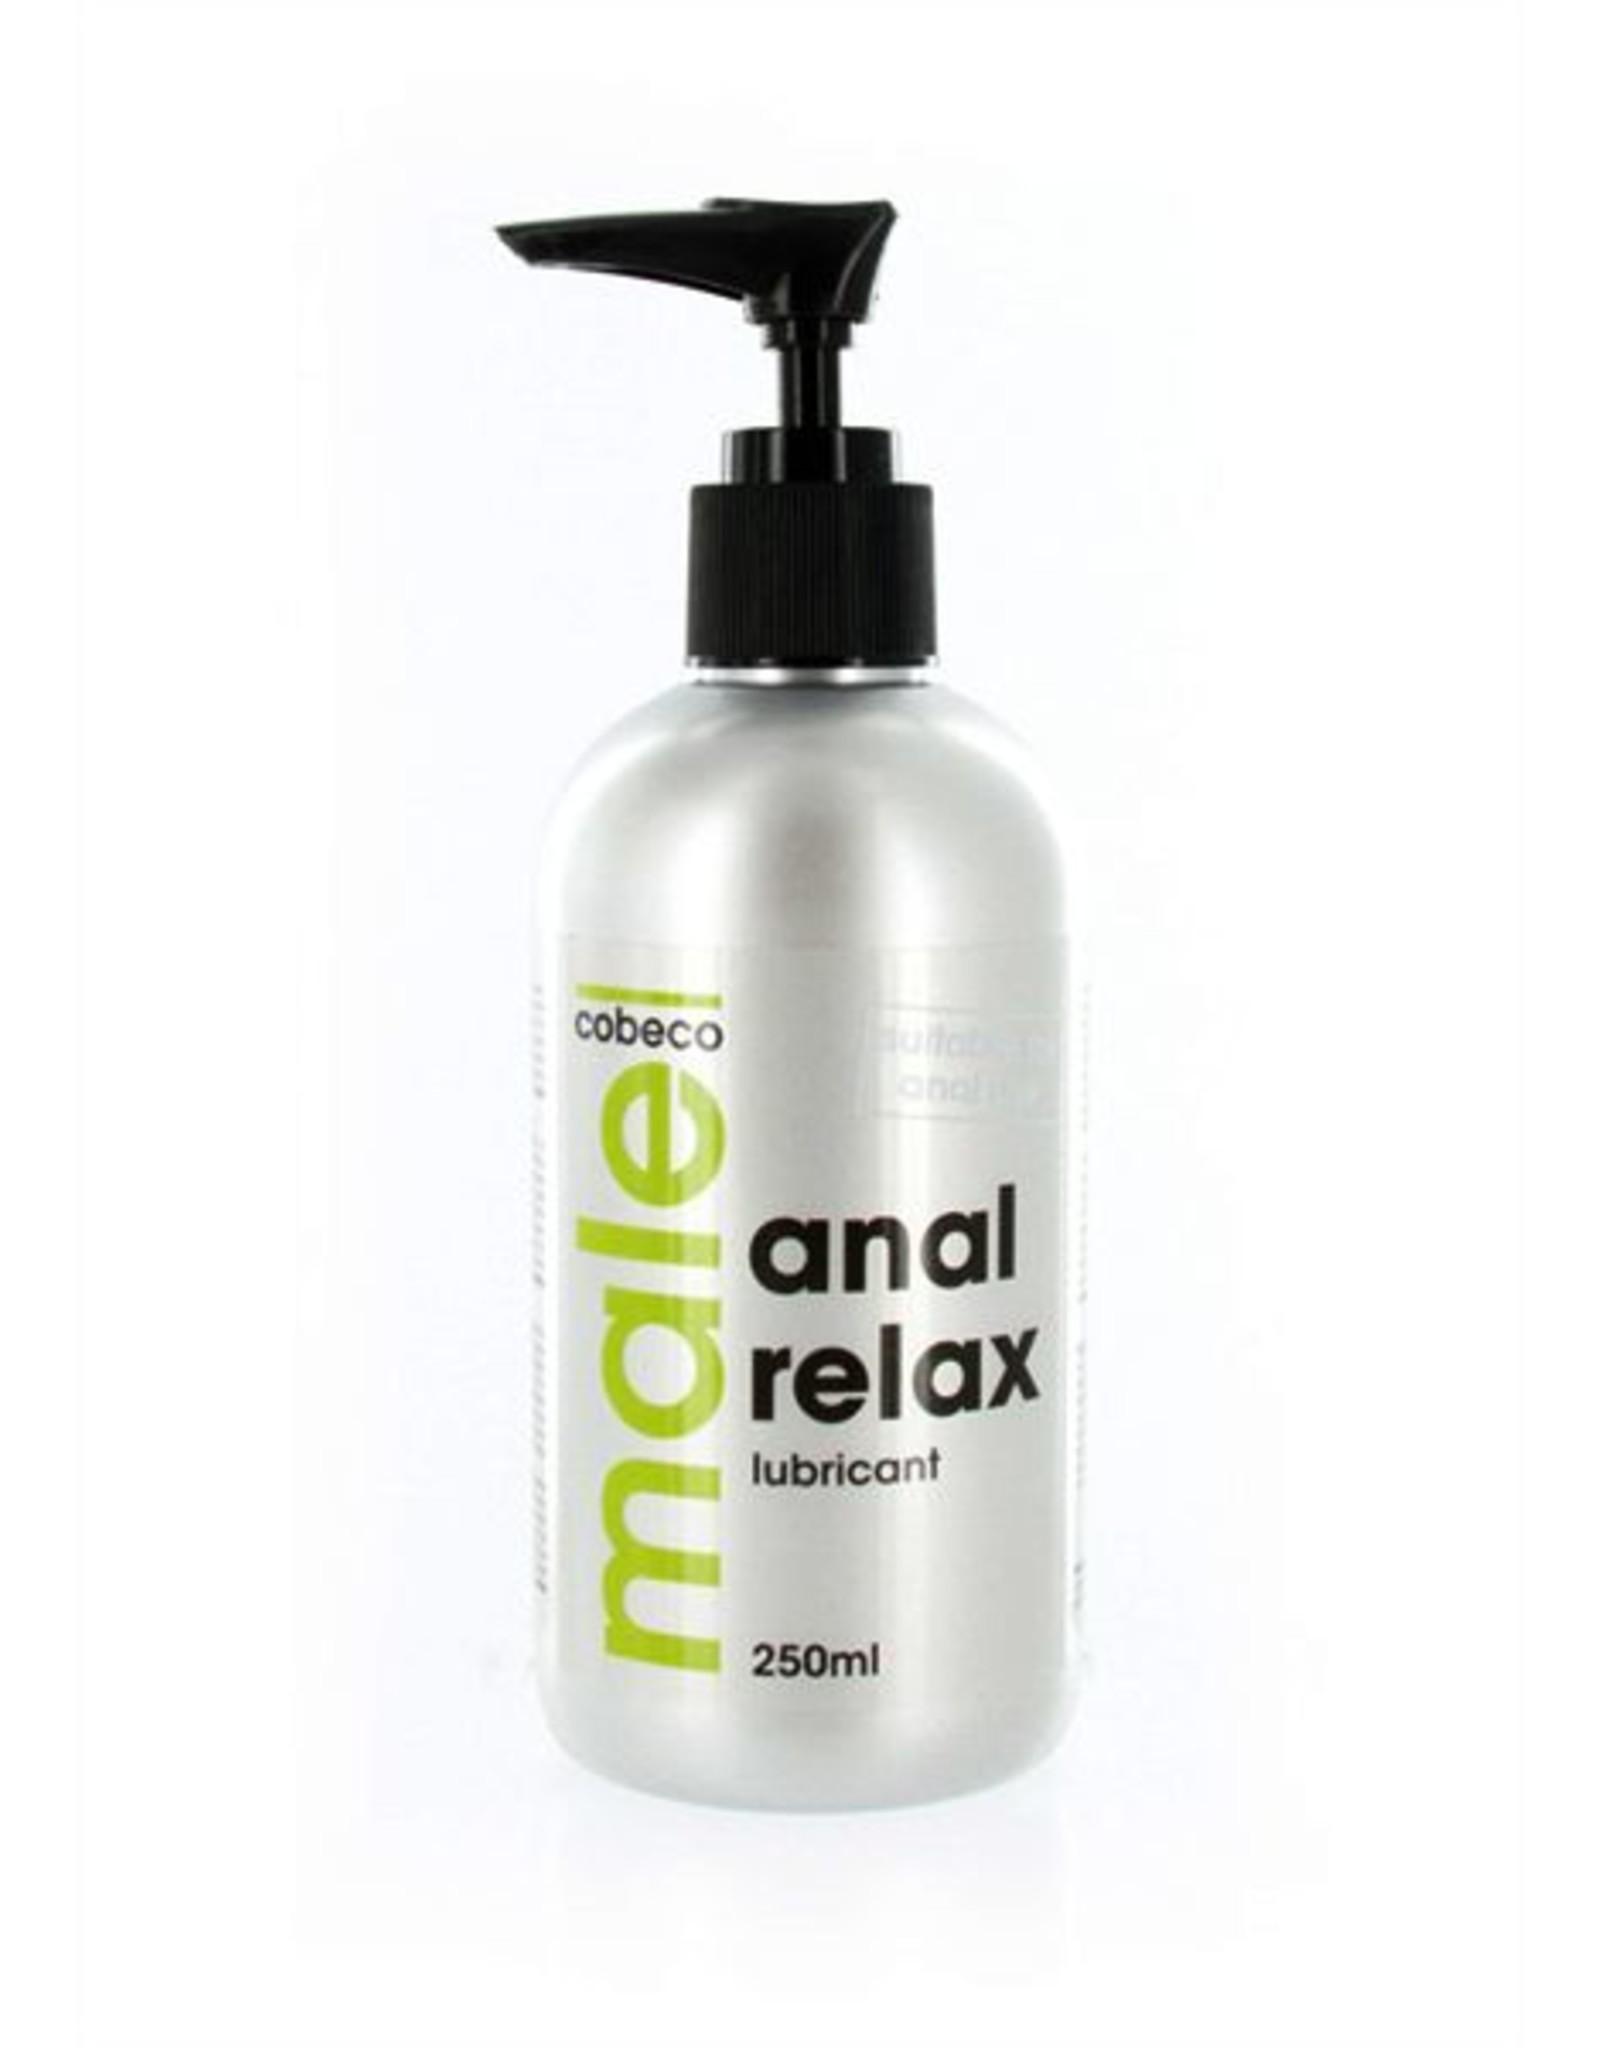 MALE Lubrifiant Anal Relax 250ml